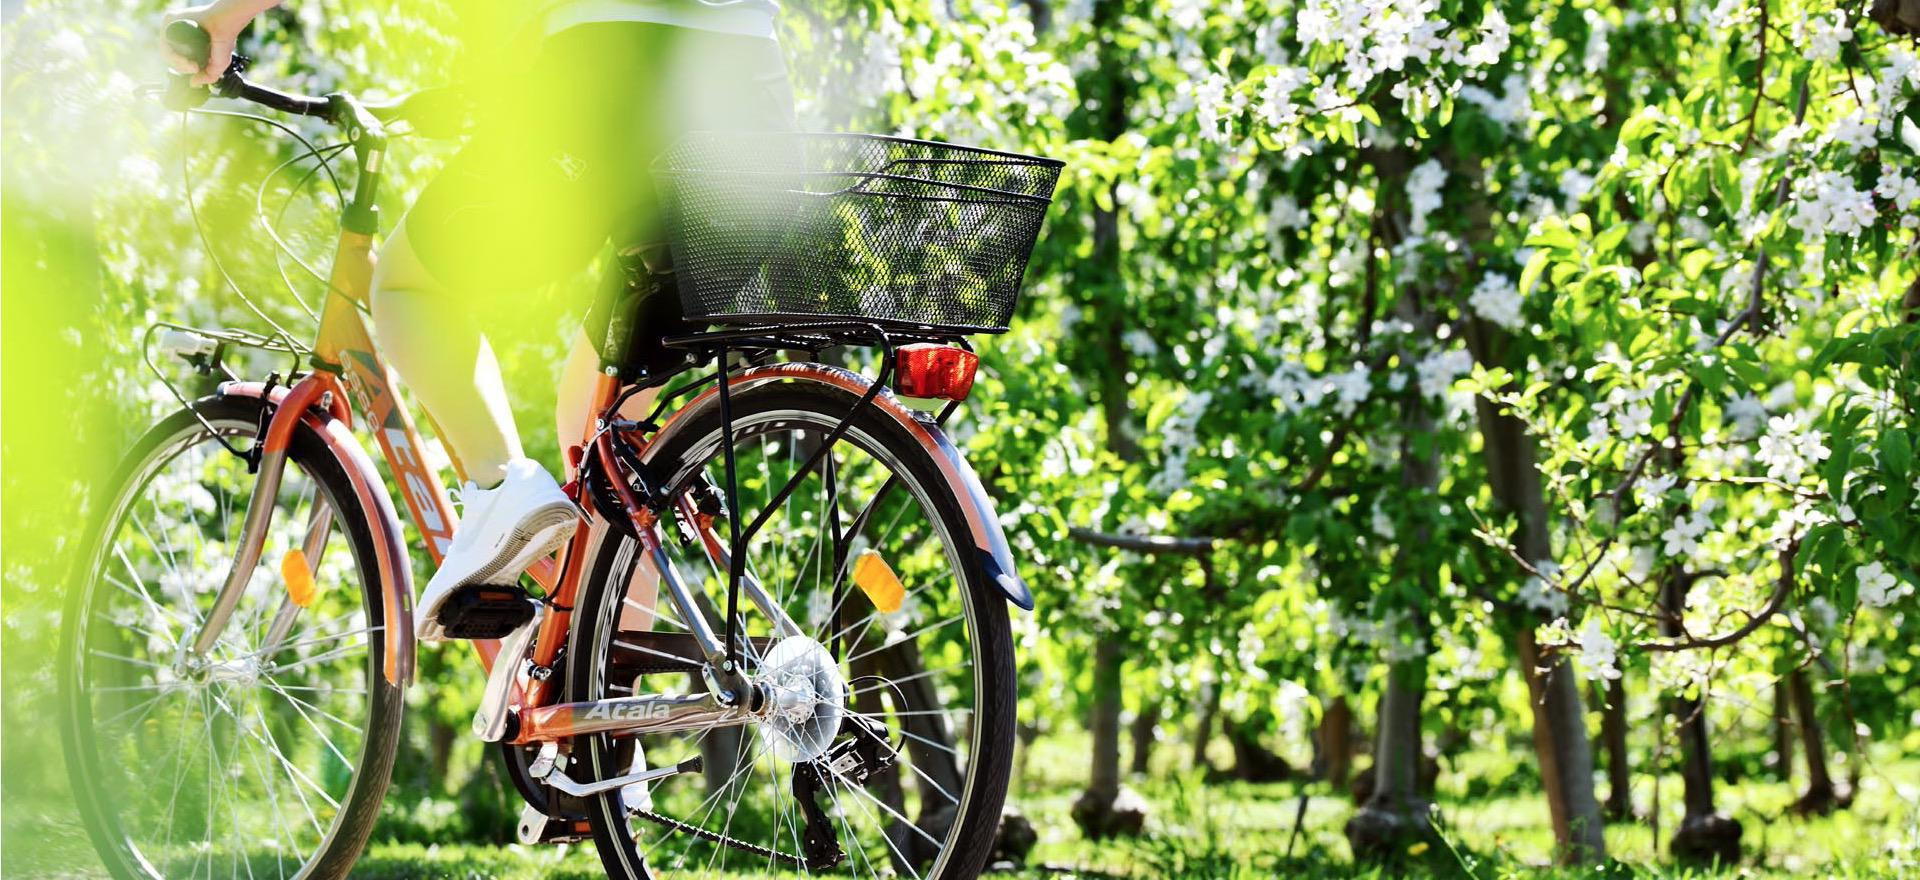 Knusse agriturismo tussen de appelbomen in de Dolomieten